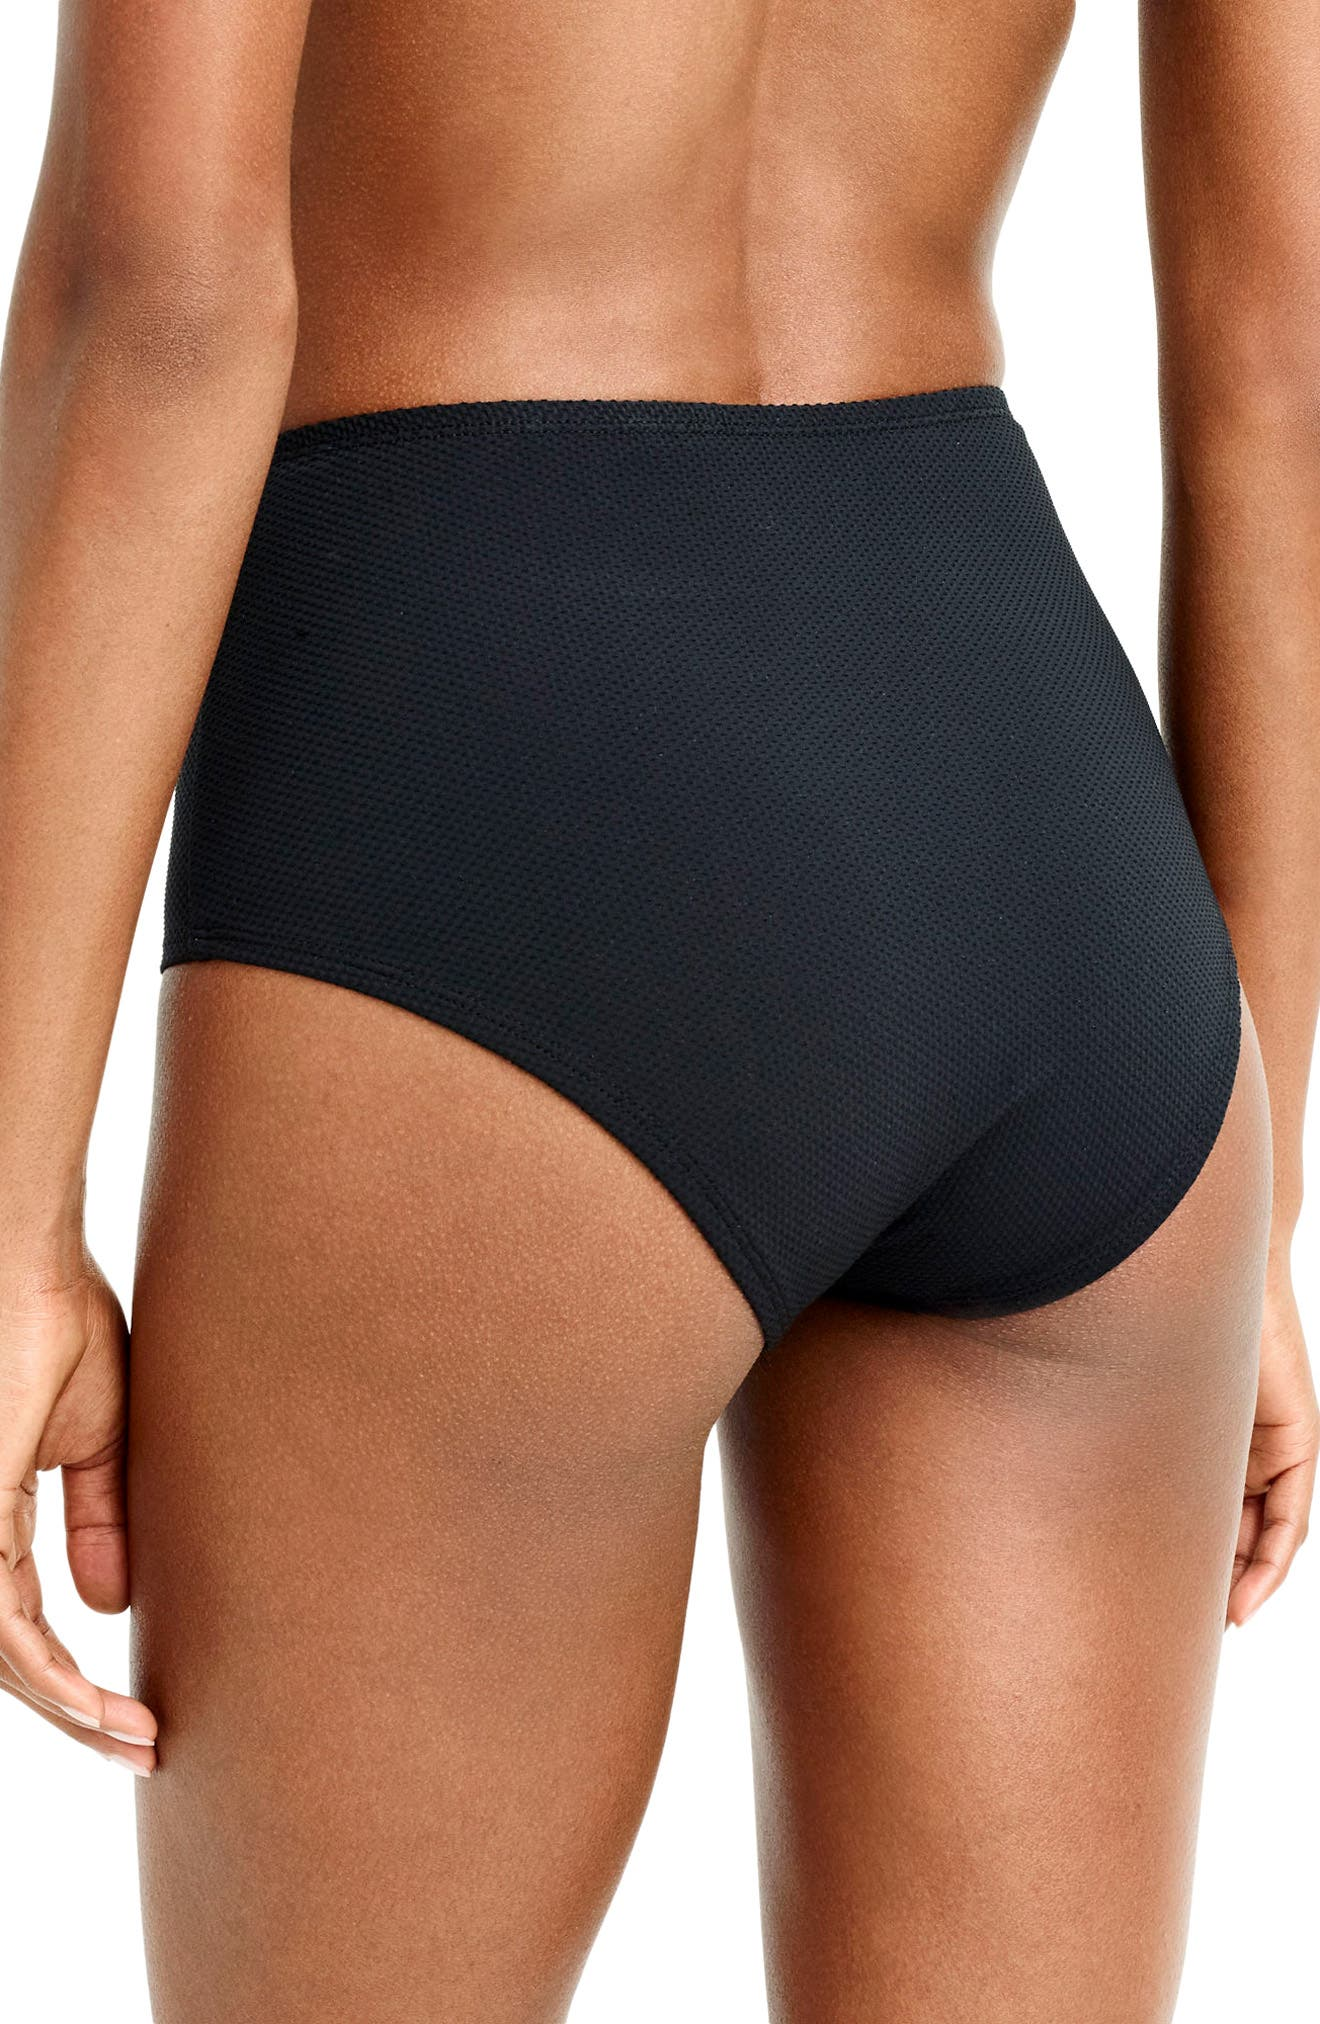 Piqué High Waist Bikini Bottoms,                             Alternate thumbnail 2, color,                             Black